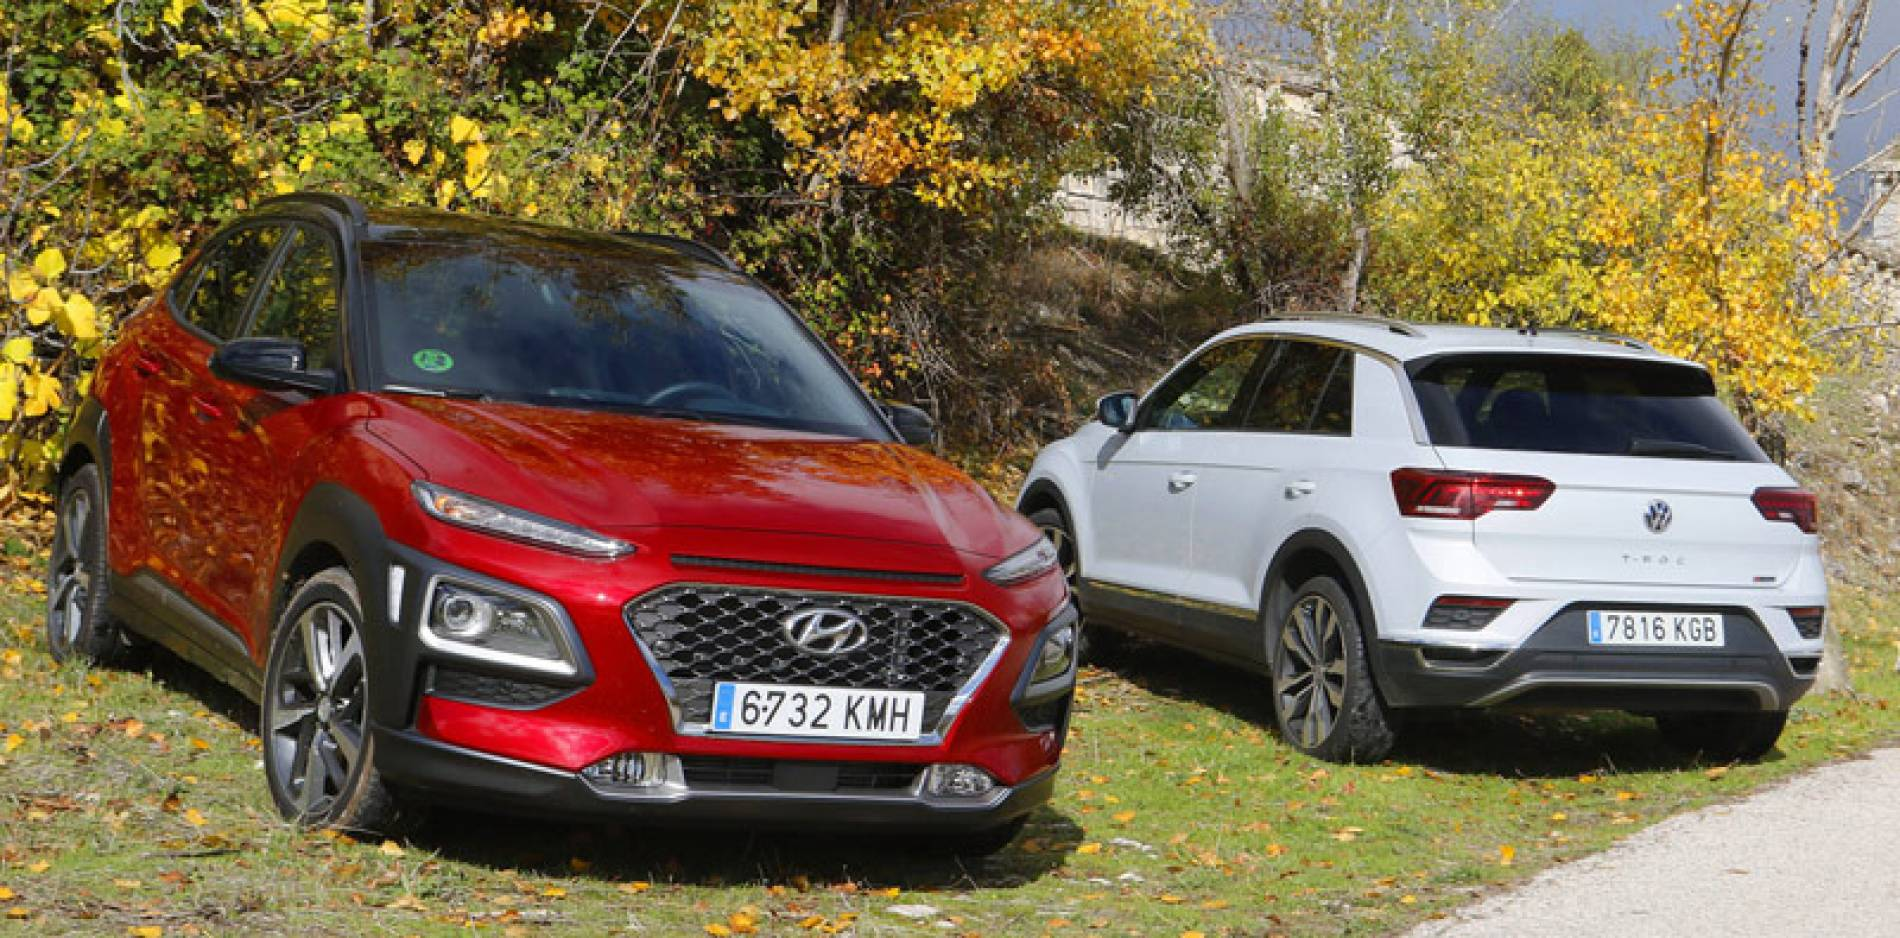 Comparativa entre SUV urbanos: Hyundai Kona vs Volkswagen T-Roc, clase dominante